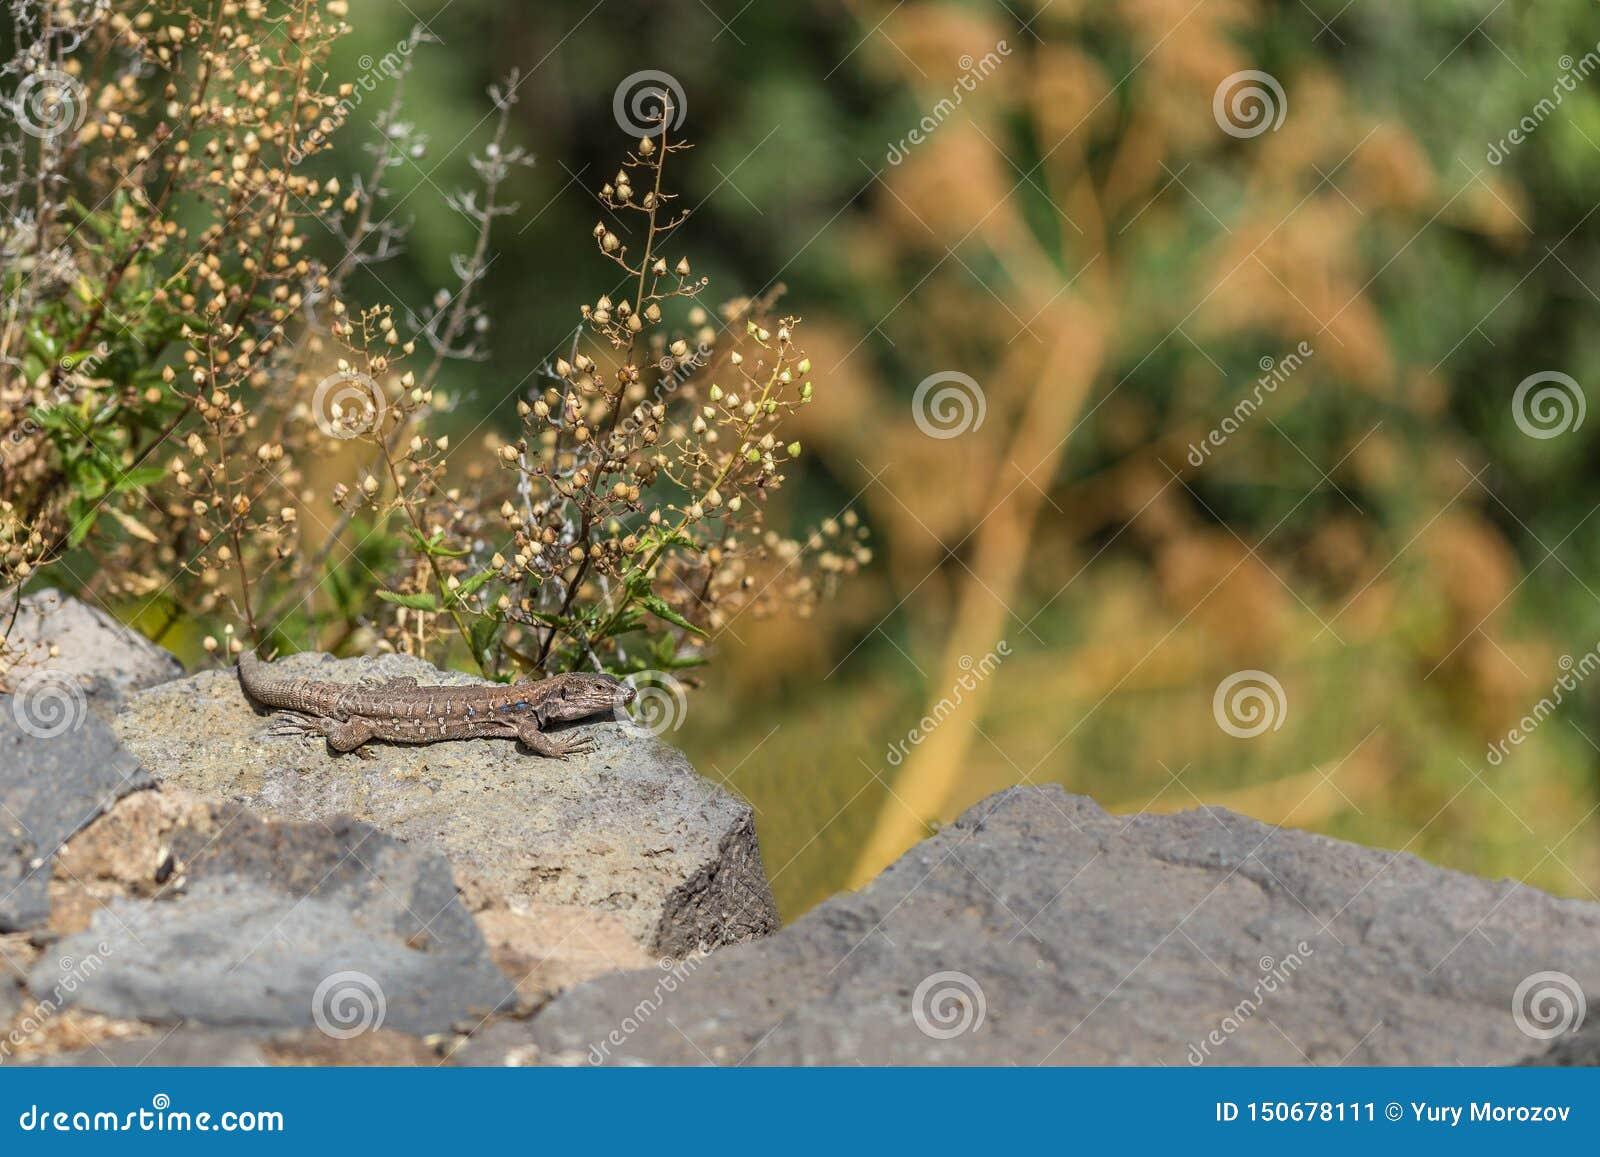 Kanarisches Reptil Tizon Azul Nationalpark Teide, Teneriffa